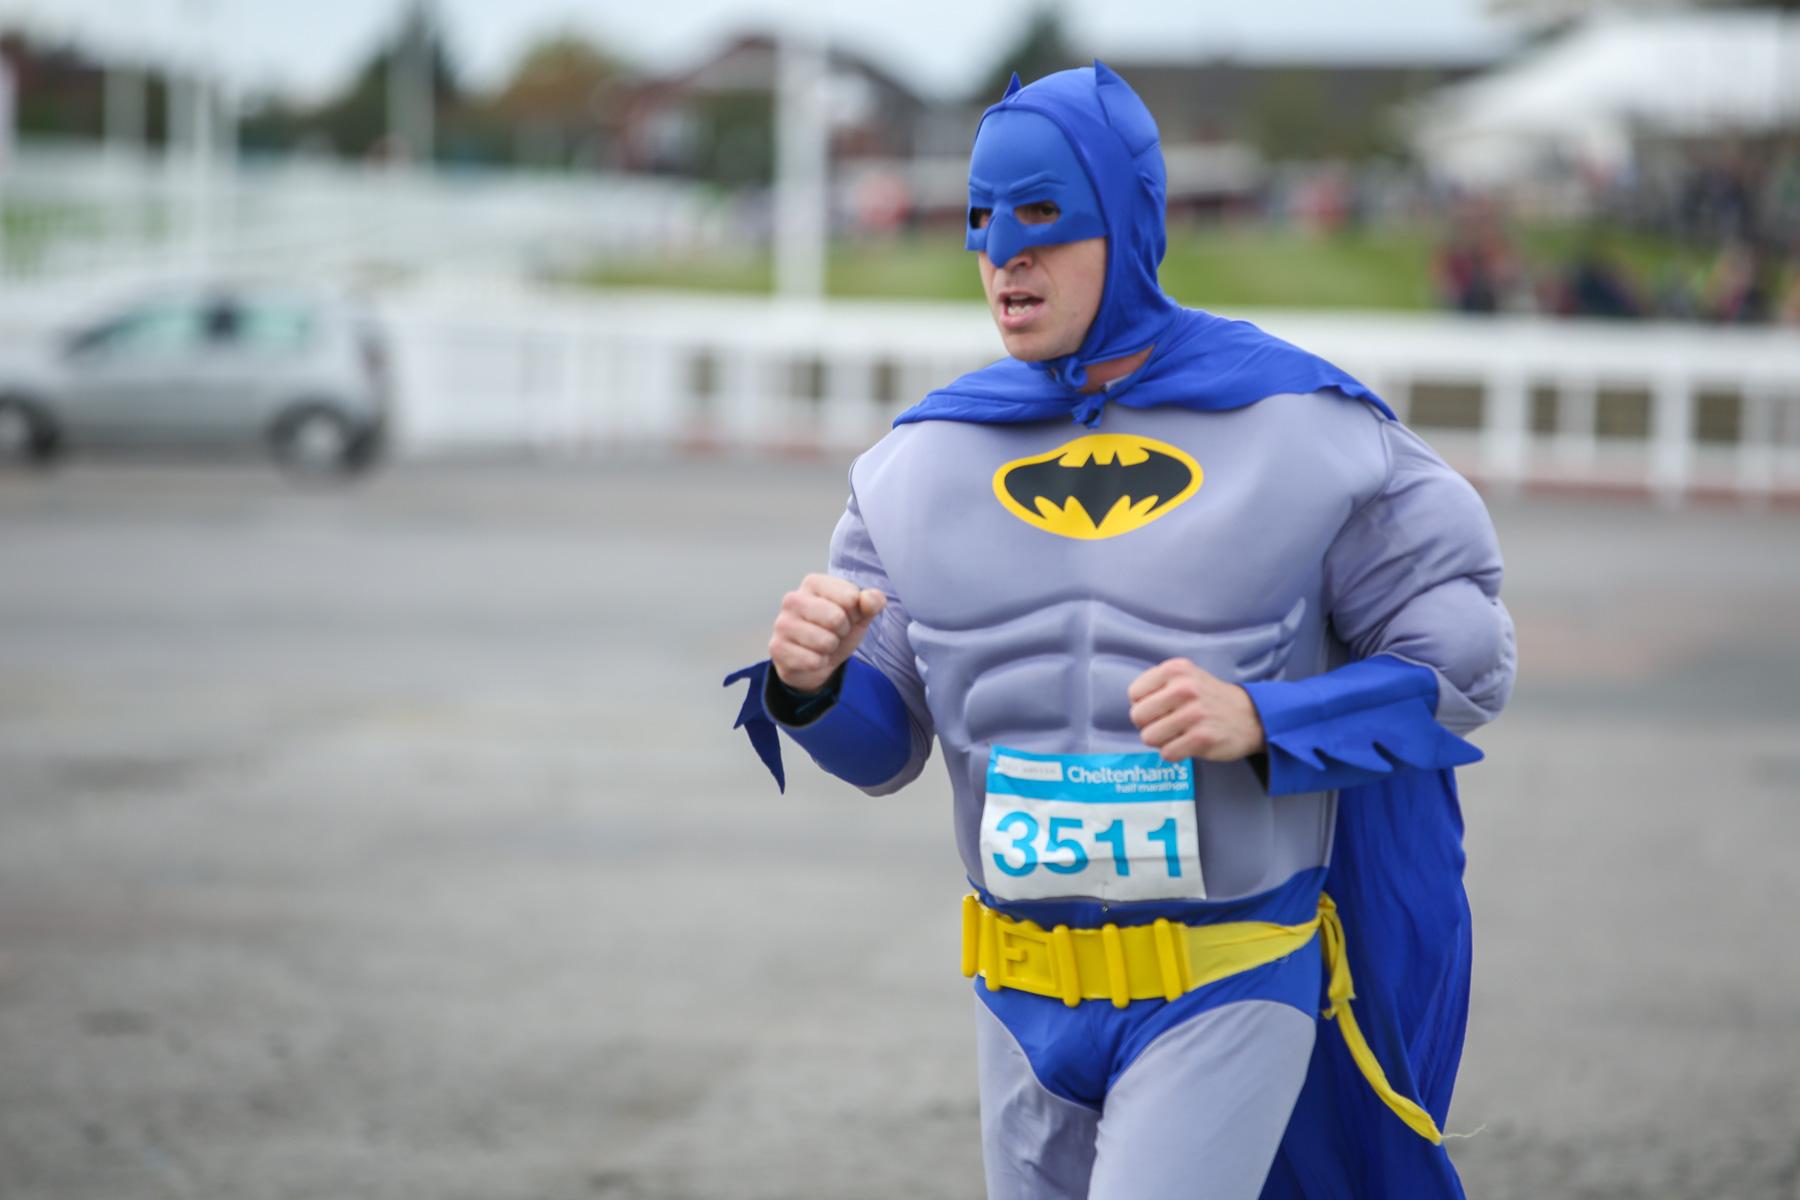 Macmillan-charity-marathon-run-cheltenham-racecourse-september-2018-natalia-smith-photography0183.jpg